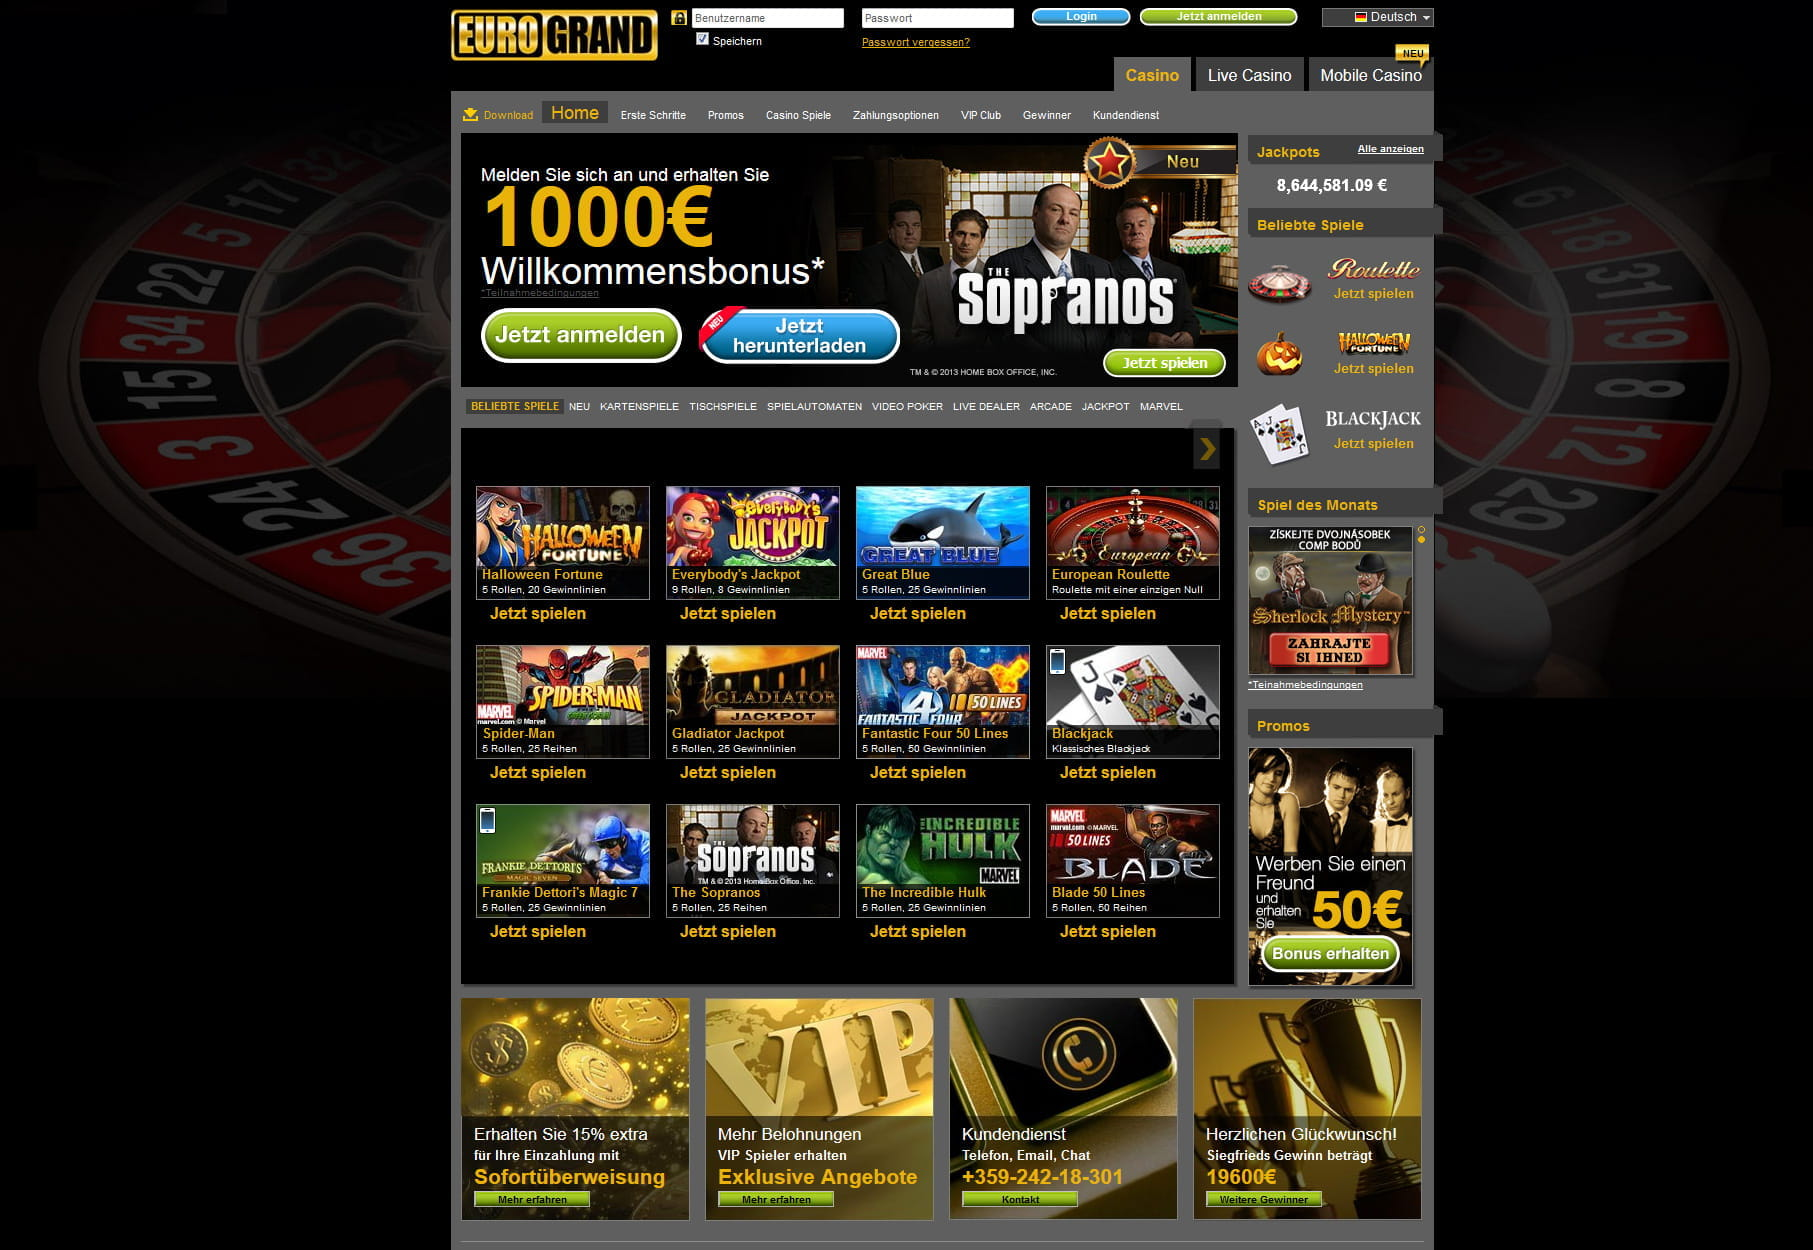 bet at home casino deutsch